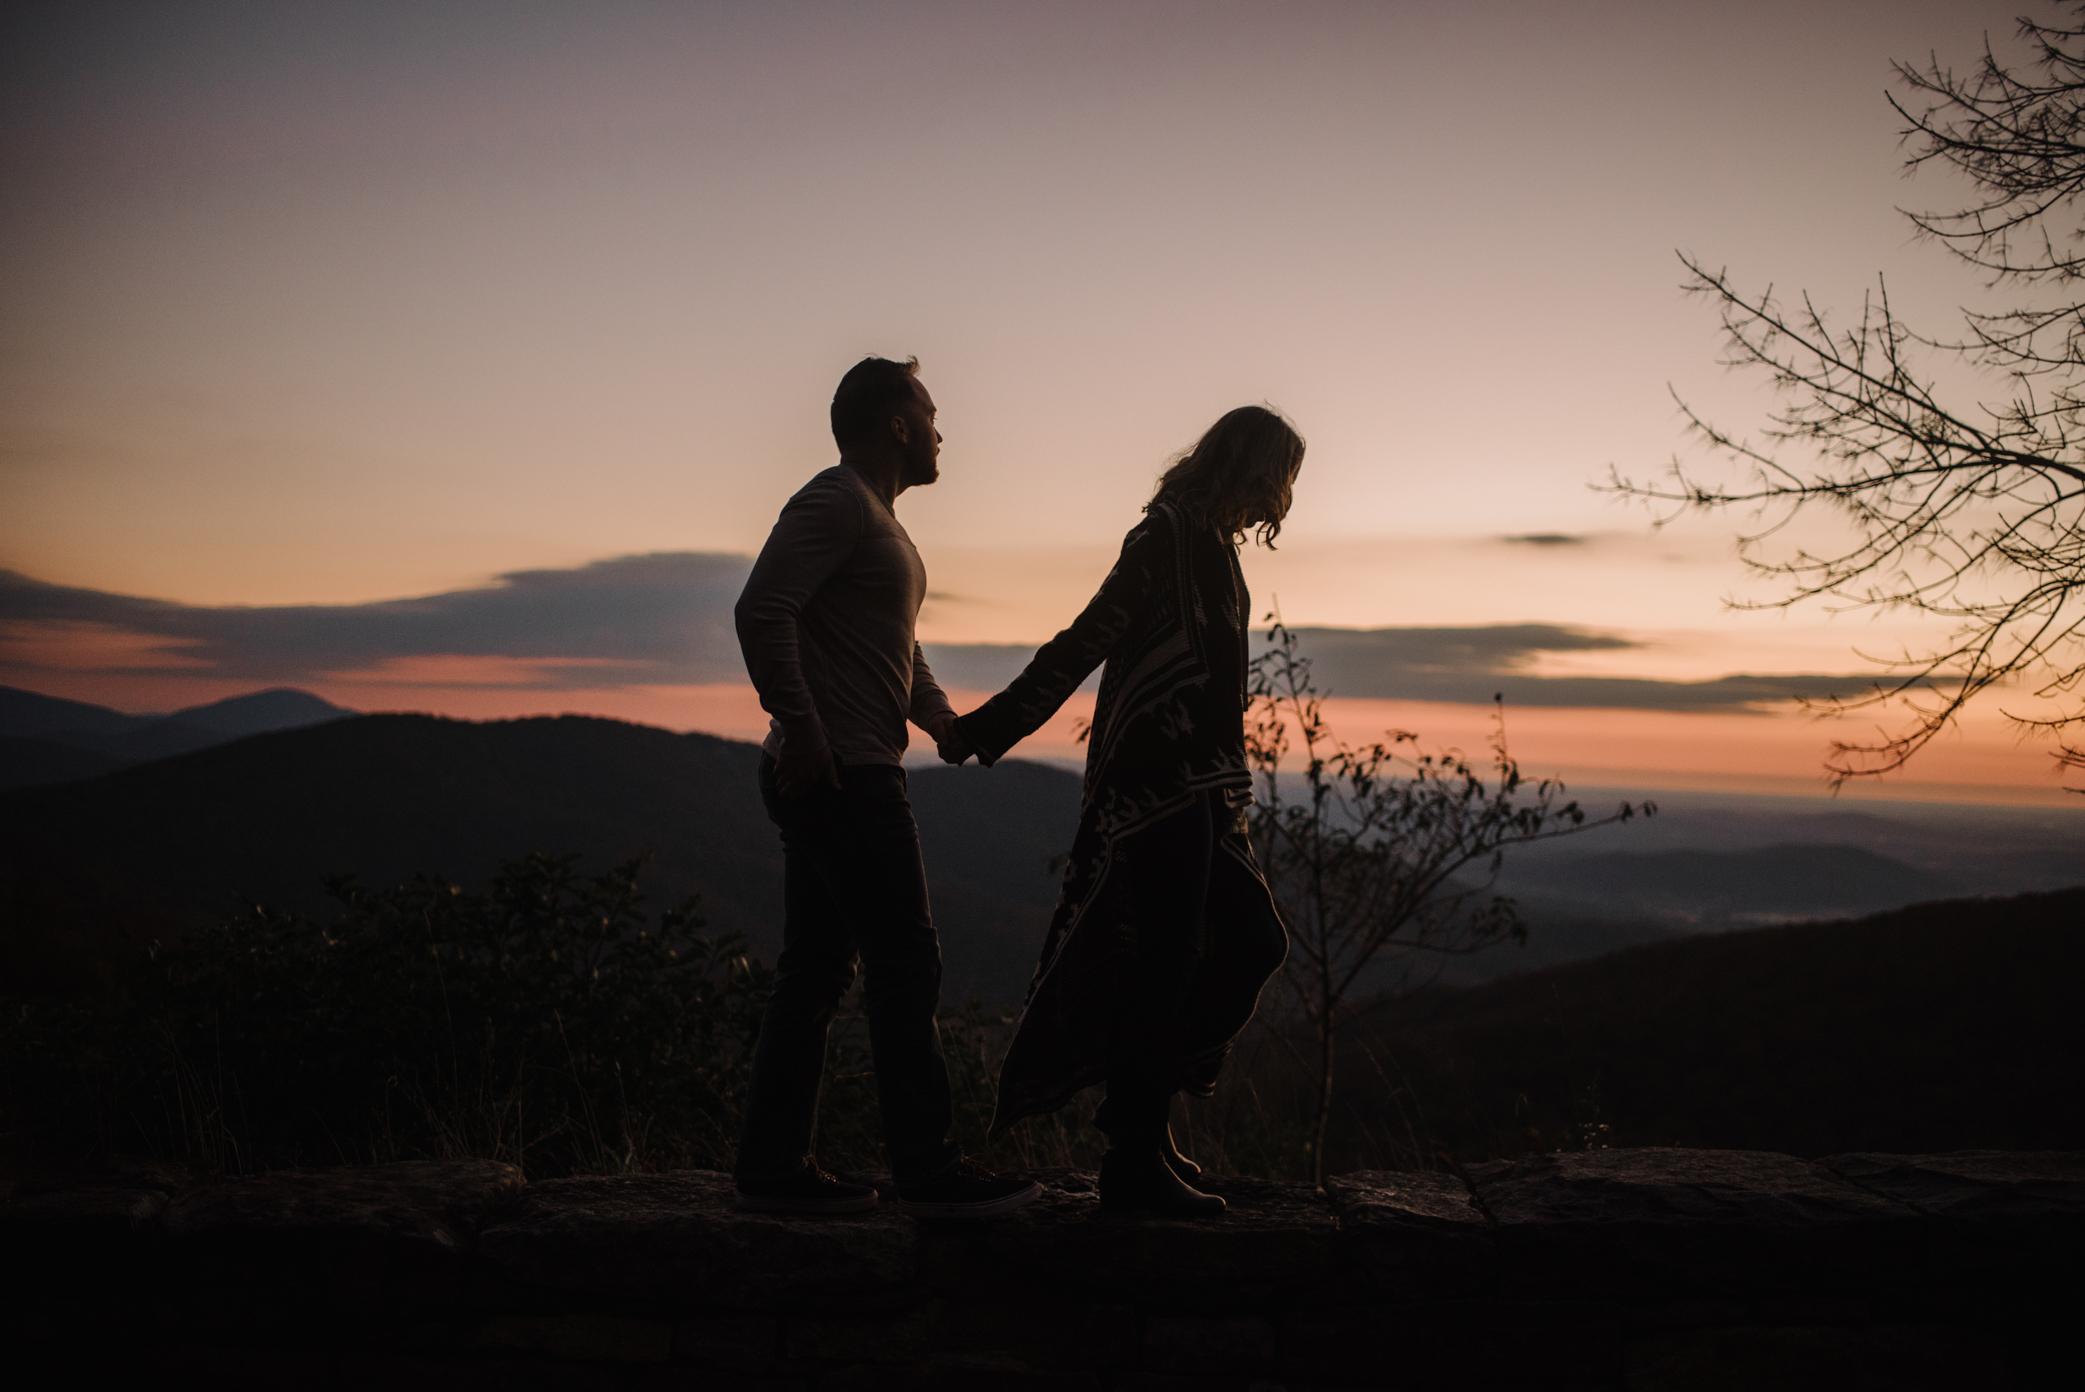 Macy and Mark - Shenandoah National Park - Fall Autumn Sunrise Couple Adventure Session - White Sails Creative - Mini Session_2.JPG